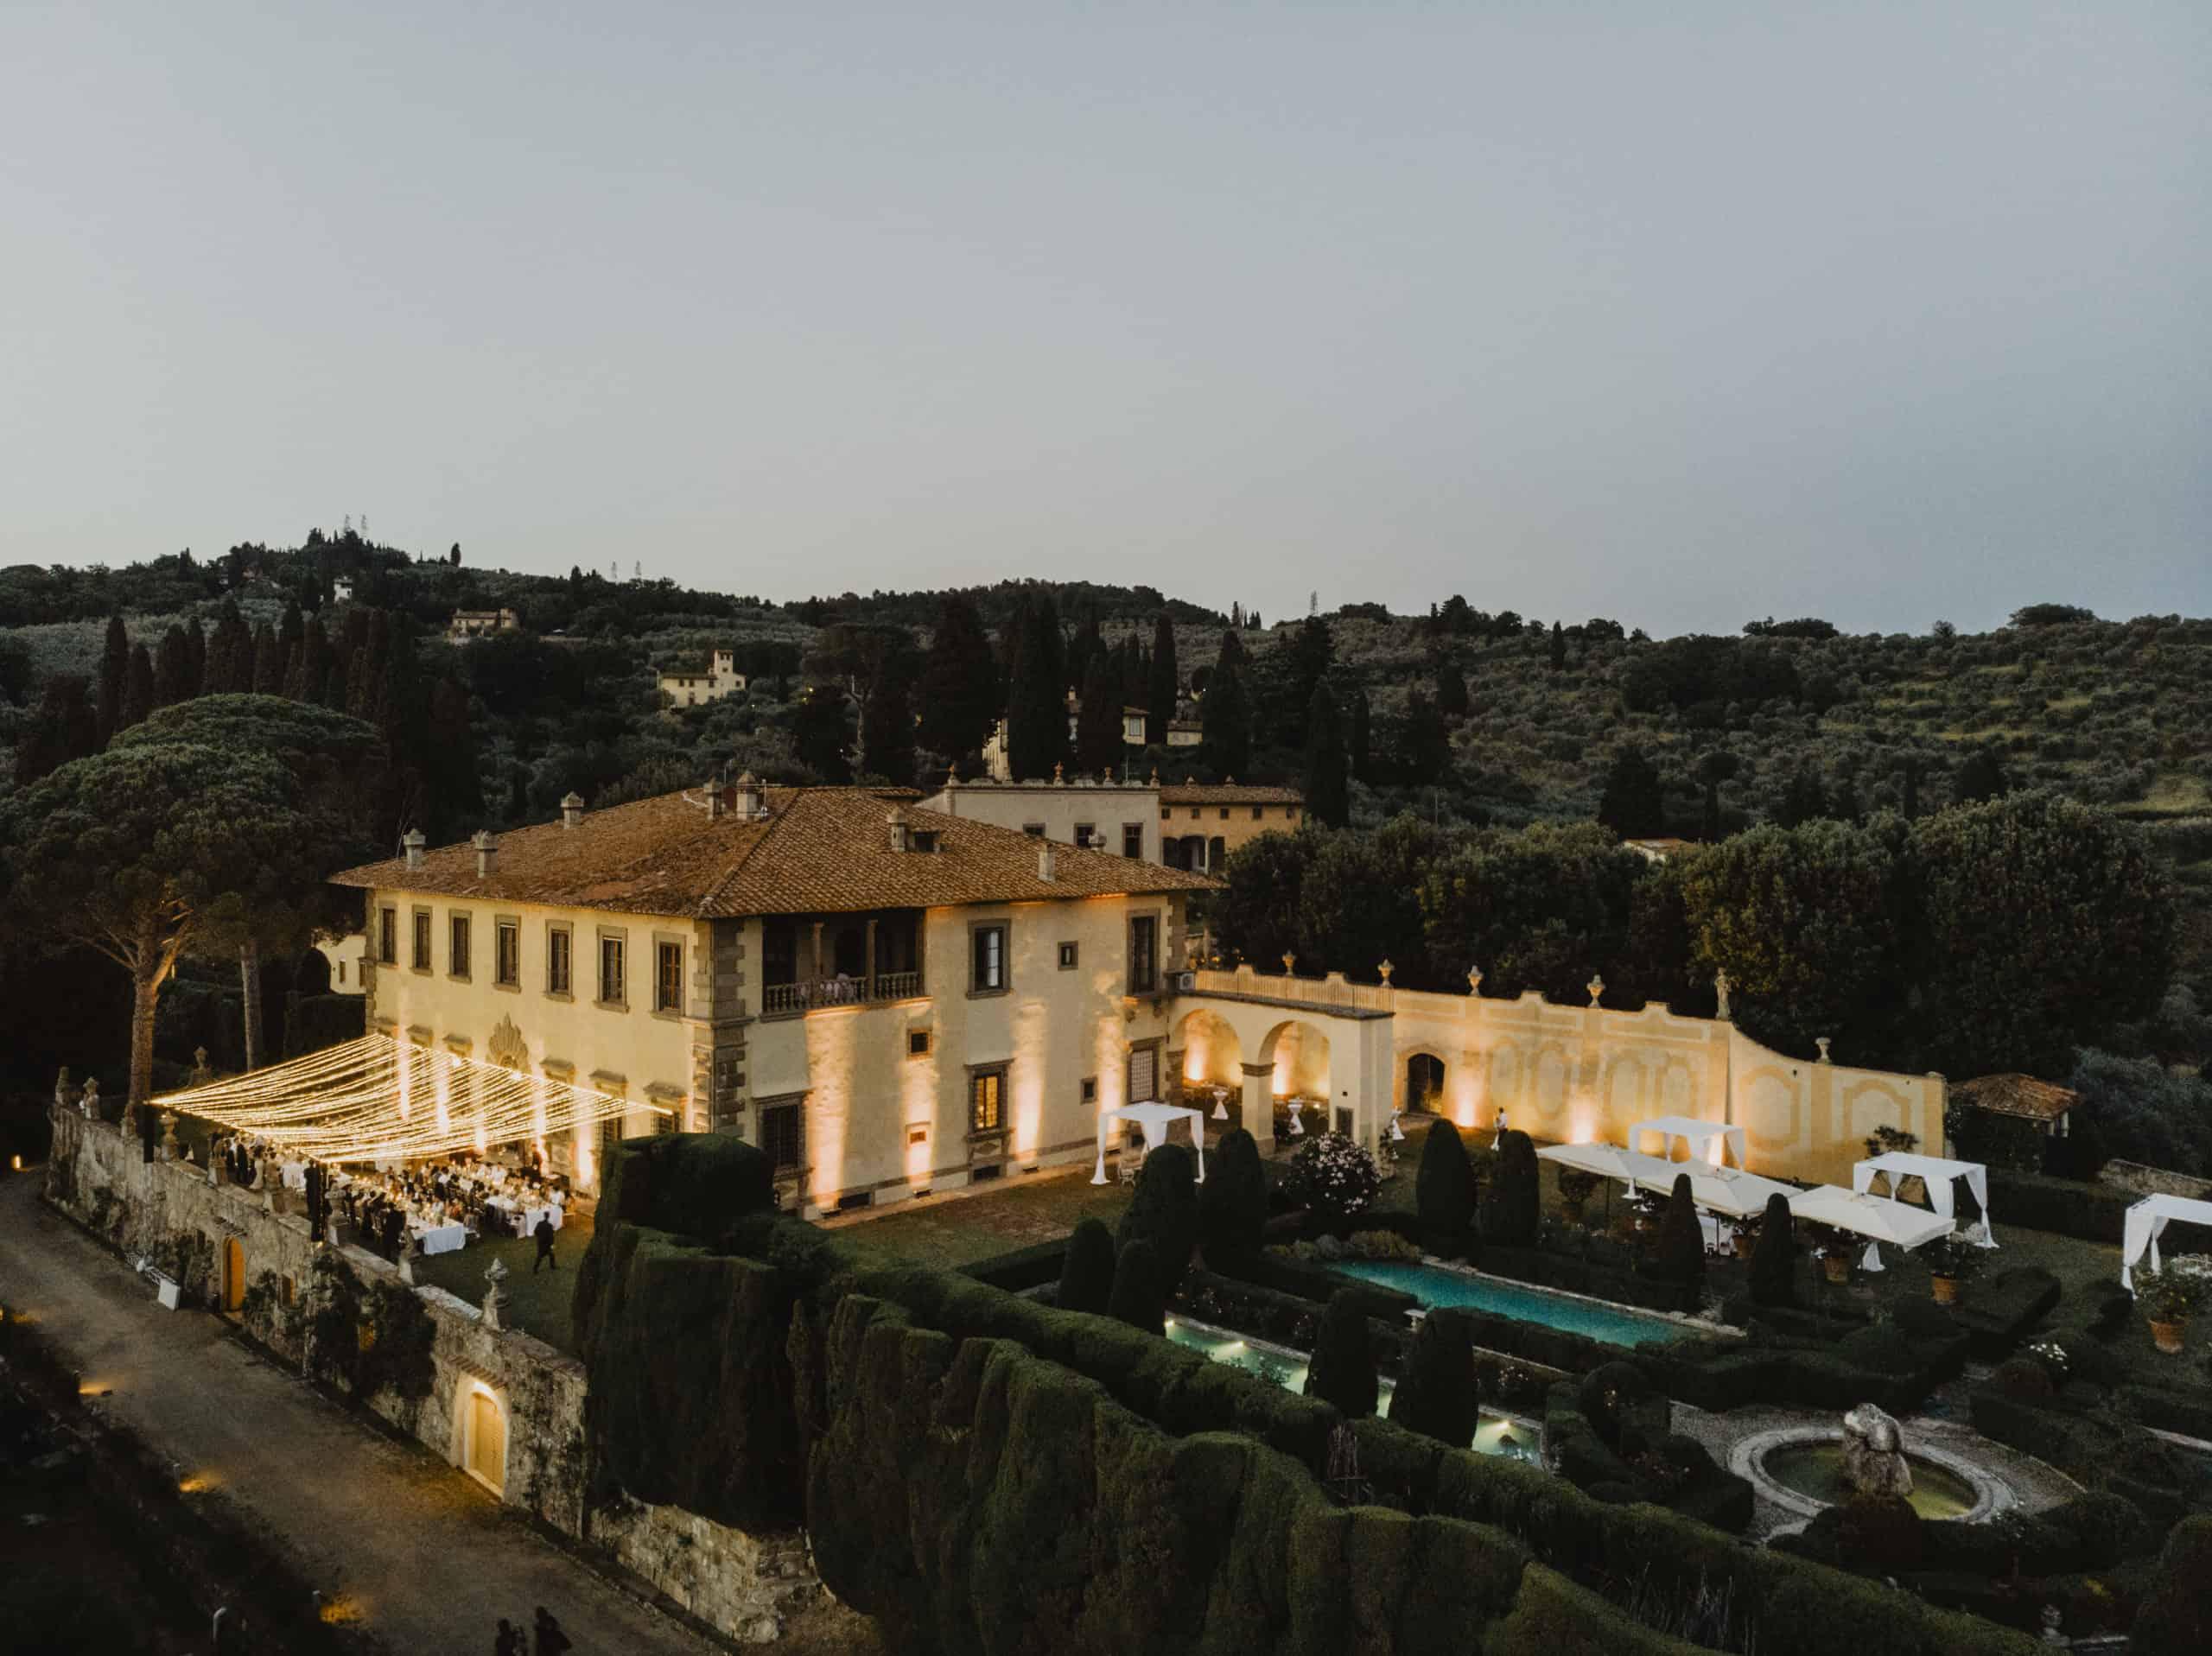 Villa Gamberia and grounds at dusk